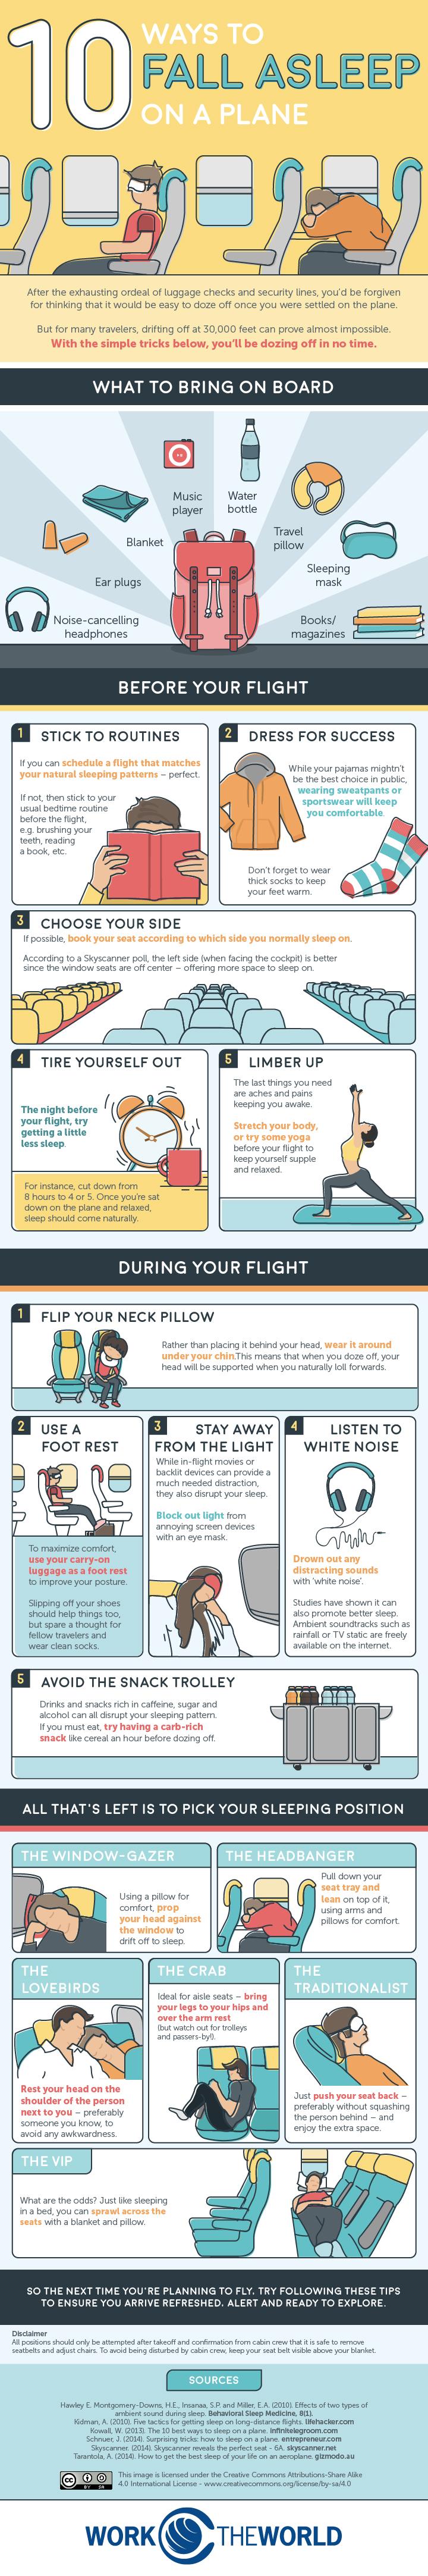 10 Ways to Fall Asleep on a Plane